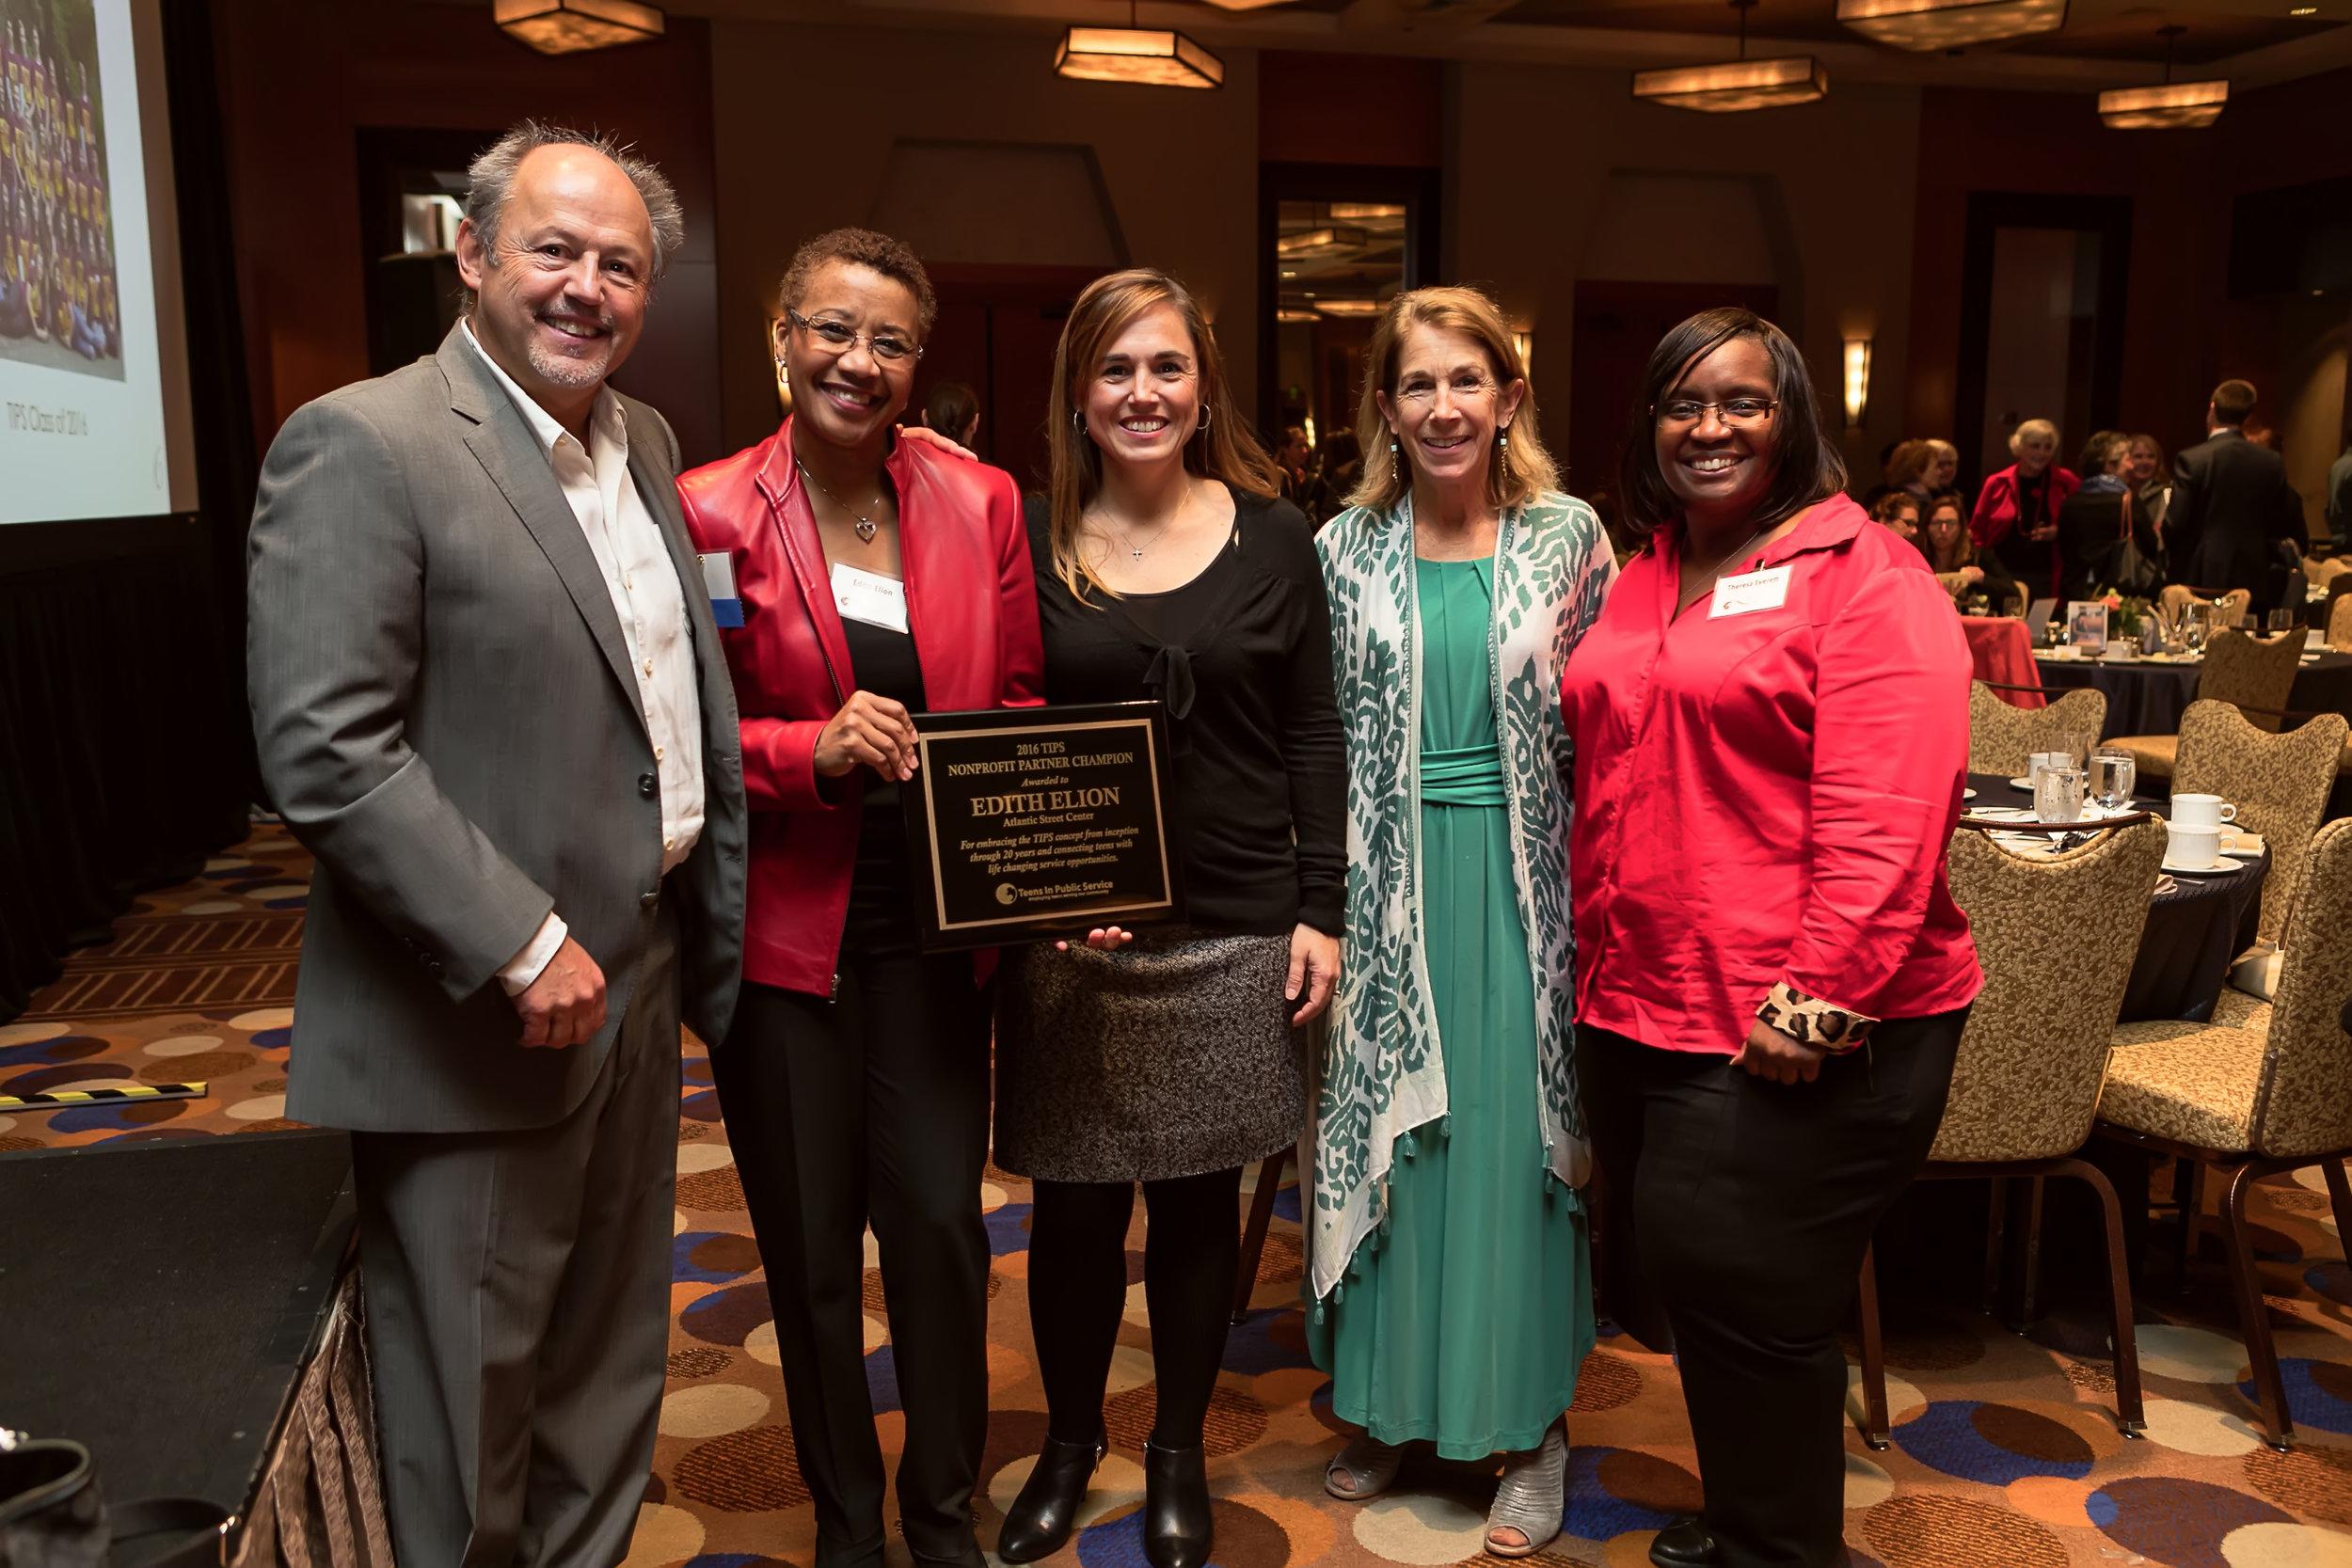 From left to right:Joe Brotherton (TIPS Board of Directors), Edith Elion (Atlantic Street Center), Tia Heim (TIPS Co-Founder), Maureen Brotherton (TIPS Co-Founder), and Theresa Everett (Atlantic Street Center)